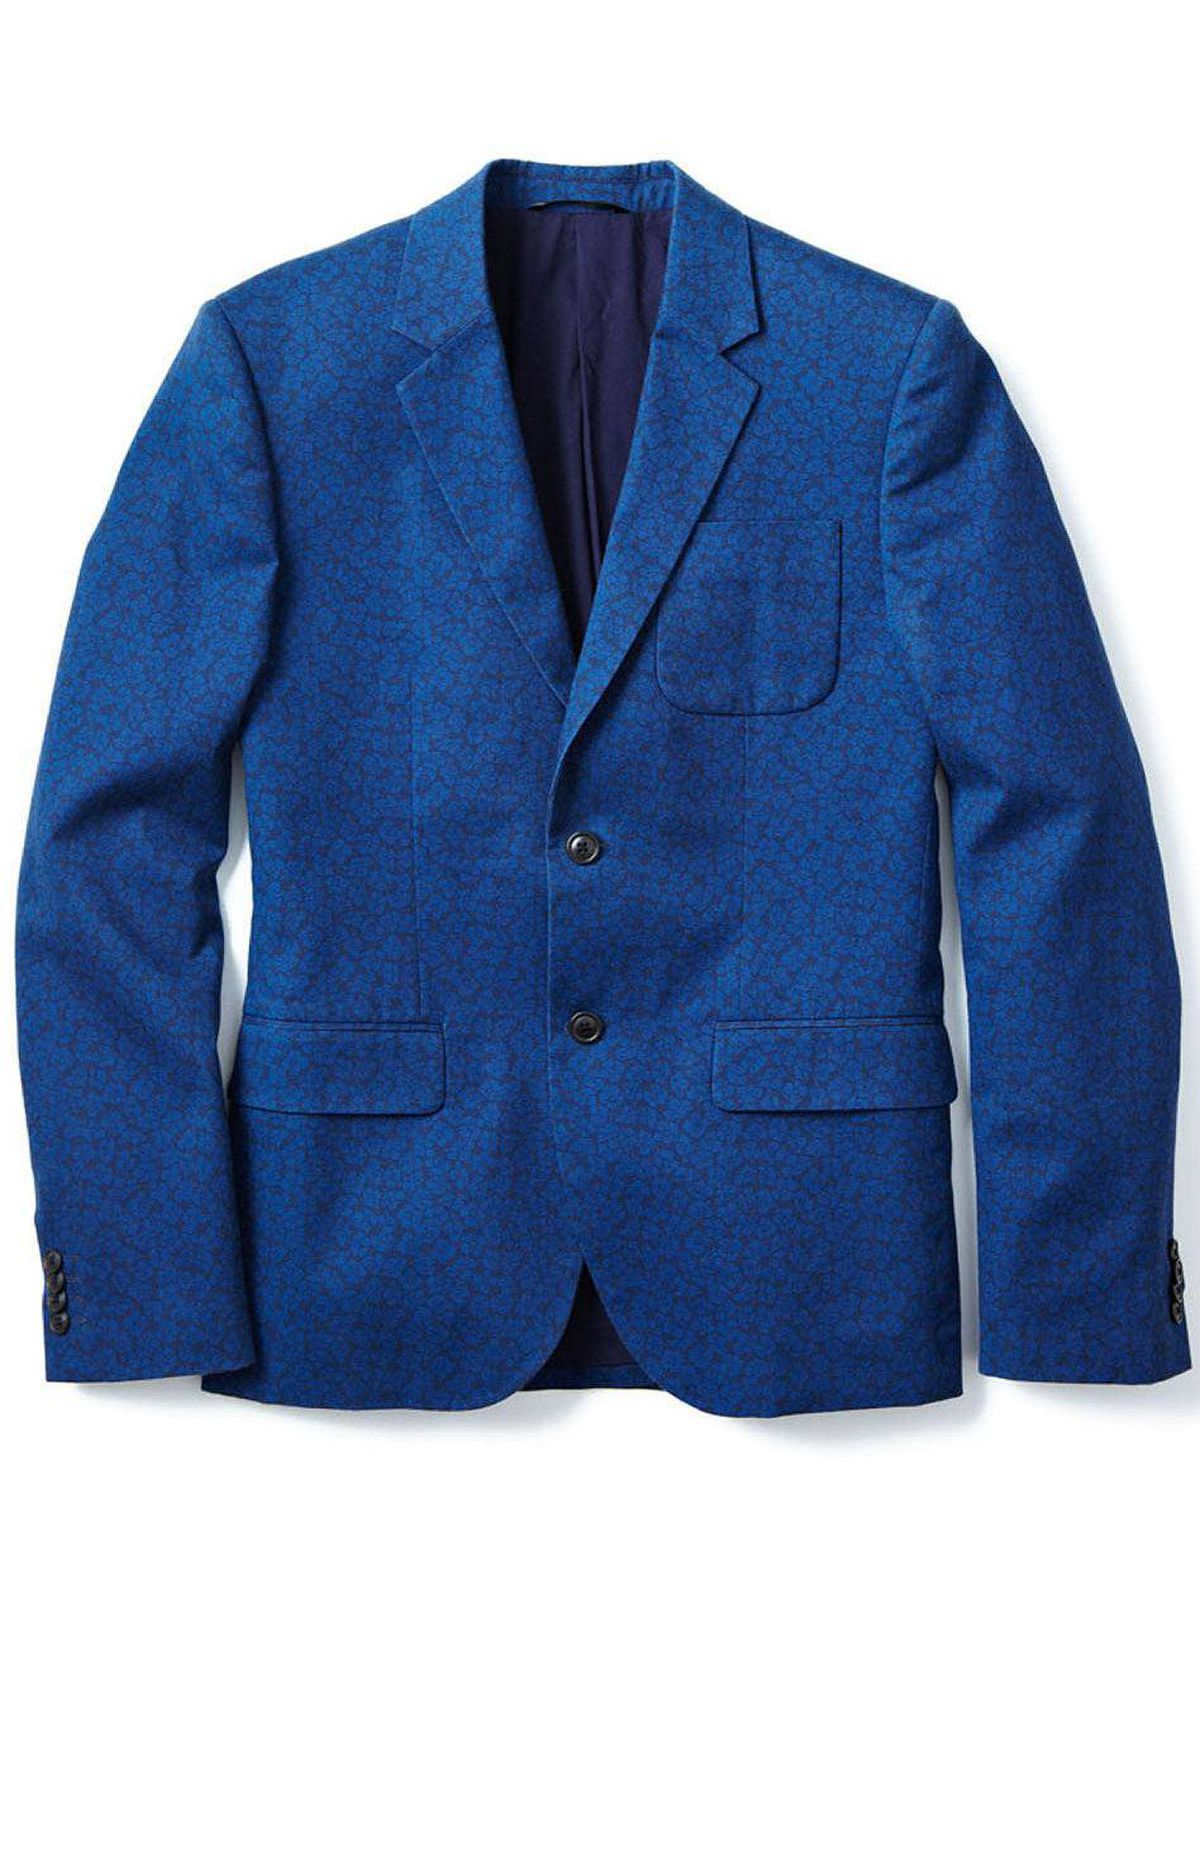 Men's floral jacket by Joe Fresh, $119 through www.joefresh.com.